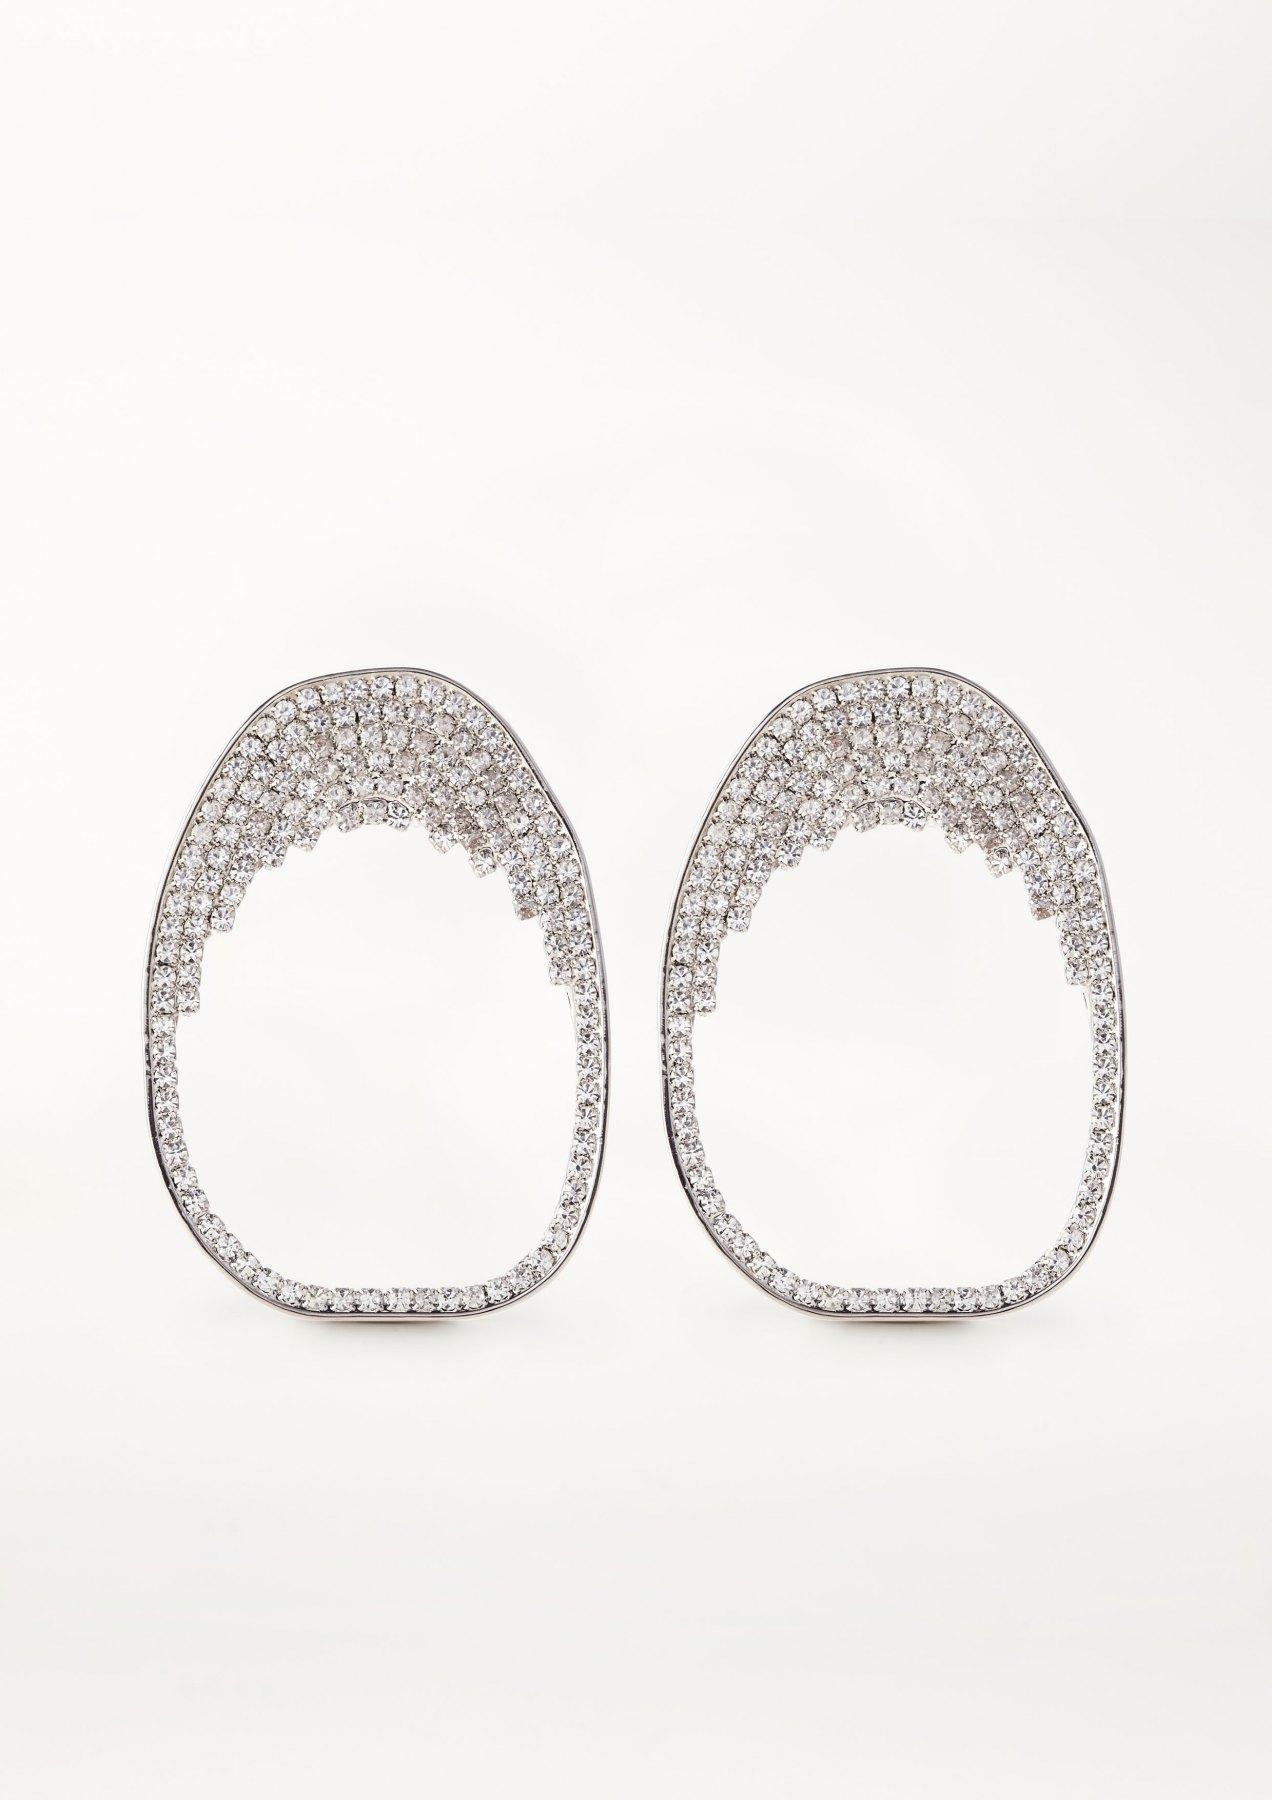 xenia bous jewellery sparkling outcut 01 earrings swarovski cristals